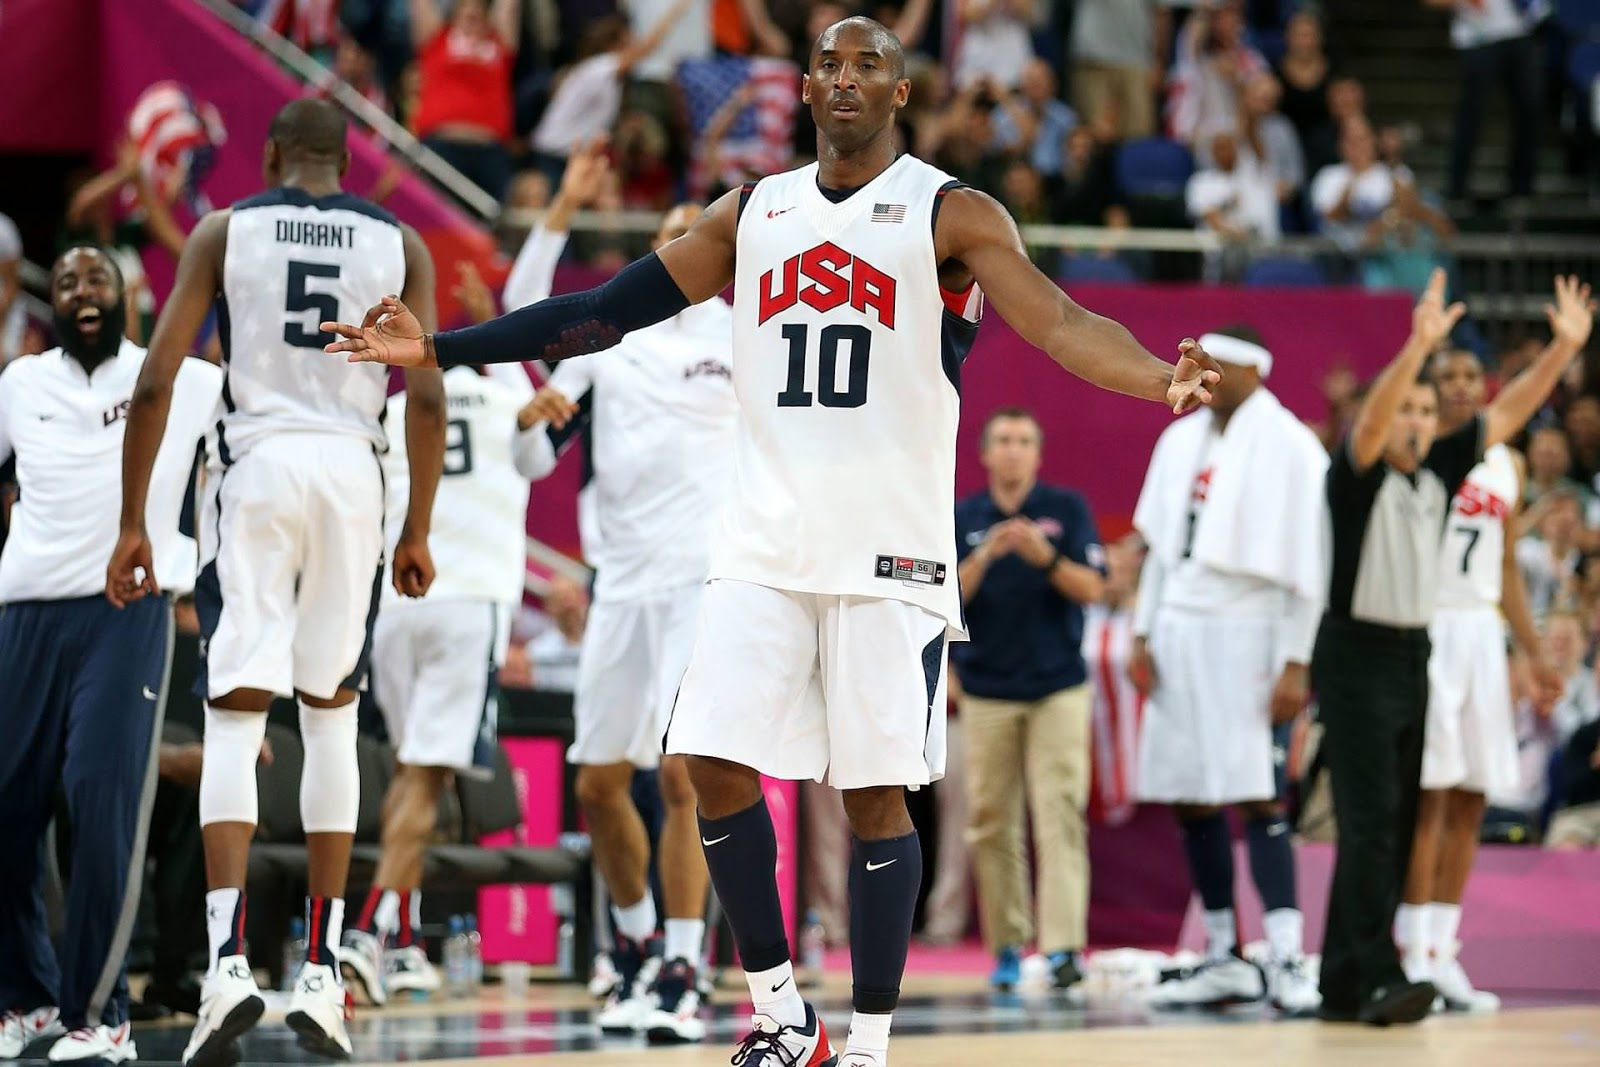 Kobe Bryant 2012 London Olympics